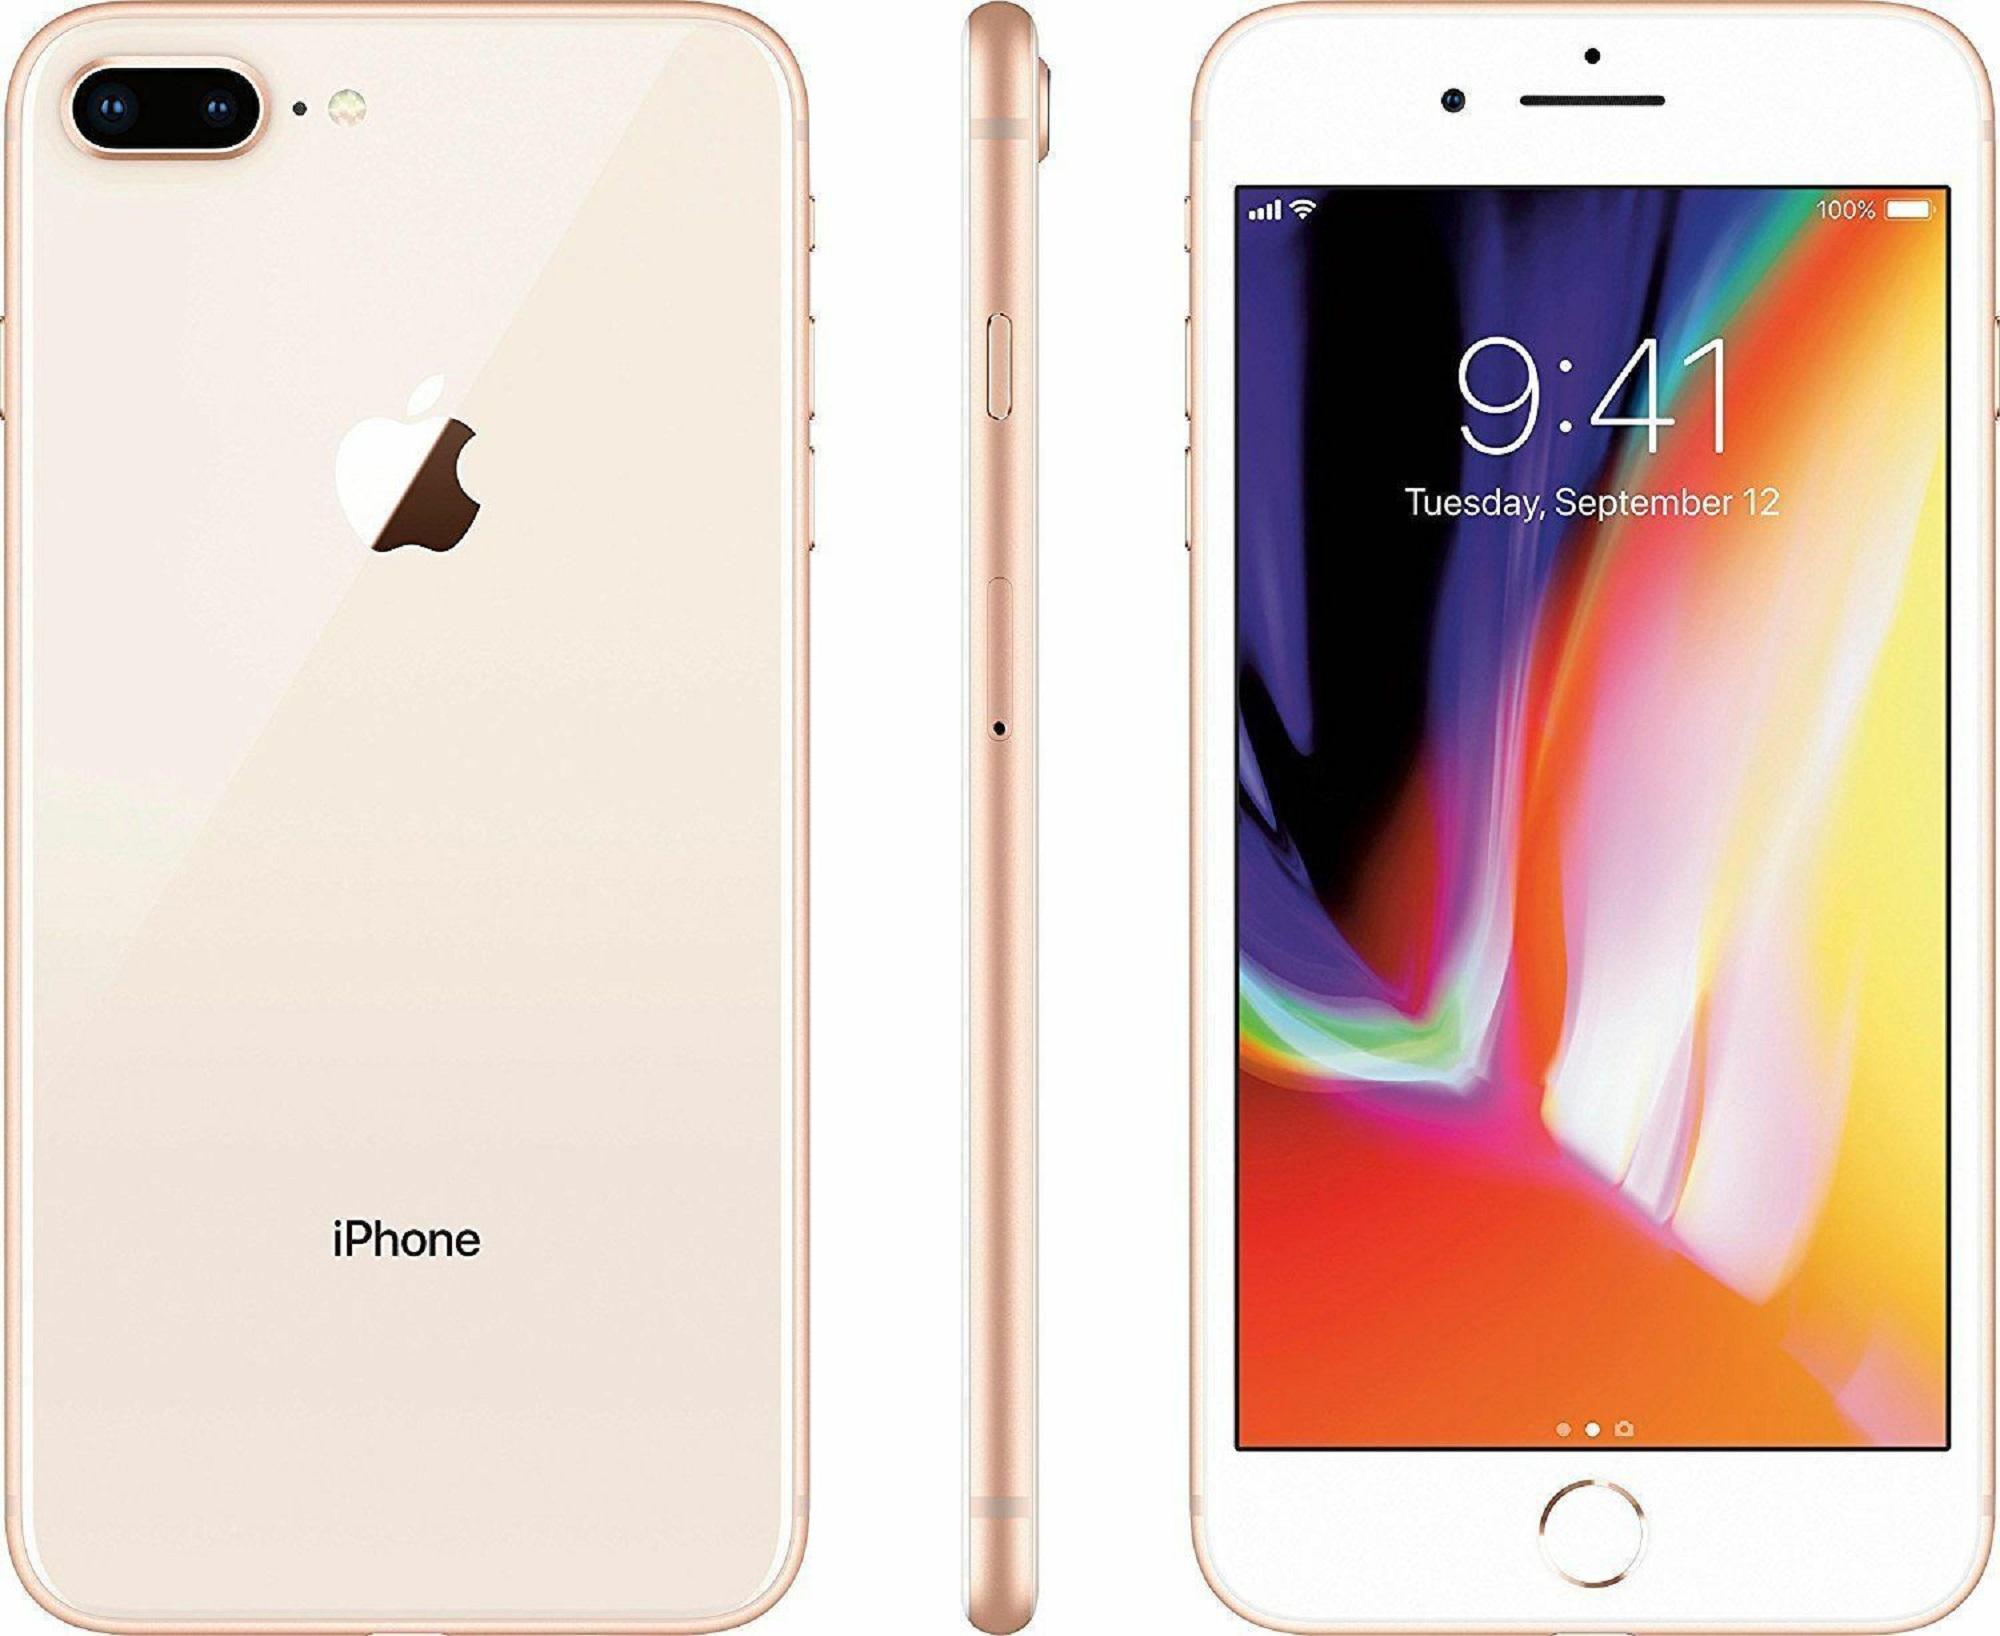 thumbnail 2 - Apple iPhone 8 Plus 64GB Factory Unlocked Smartphone - Very Good